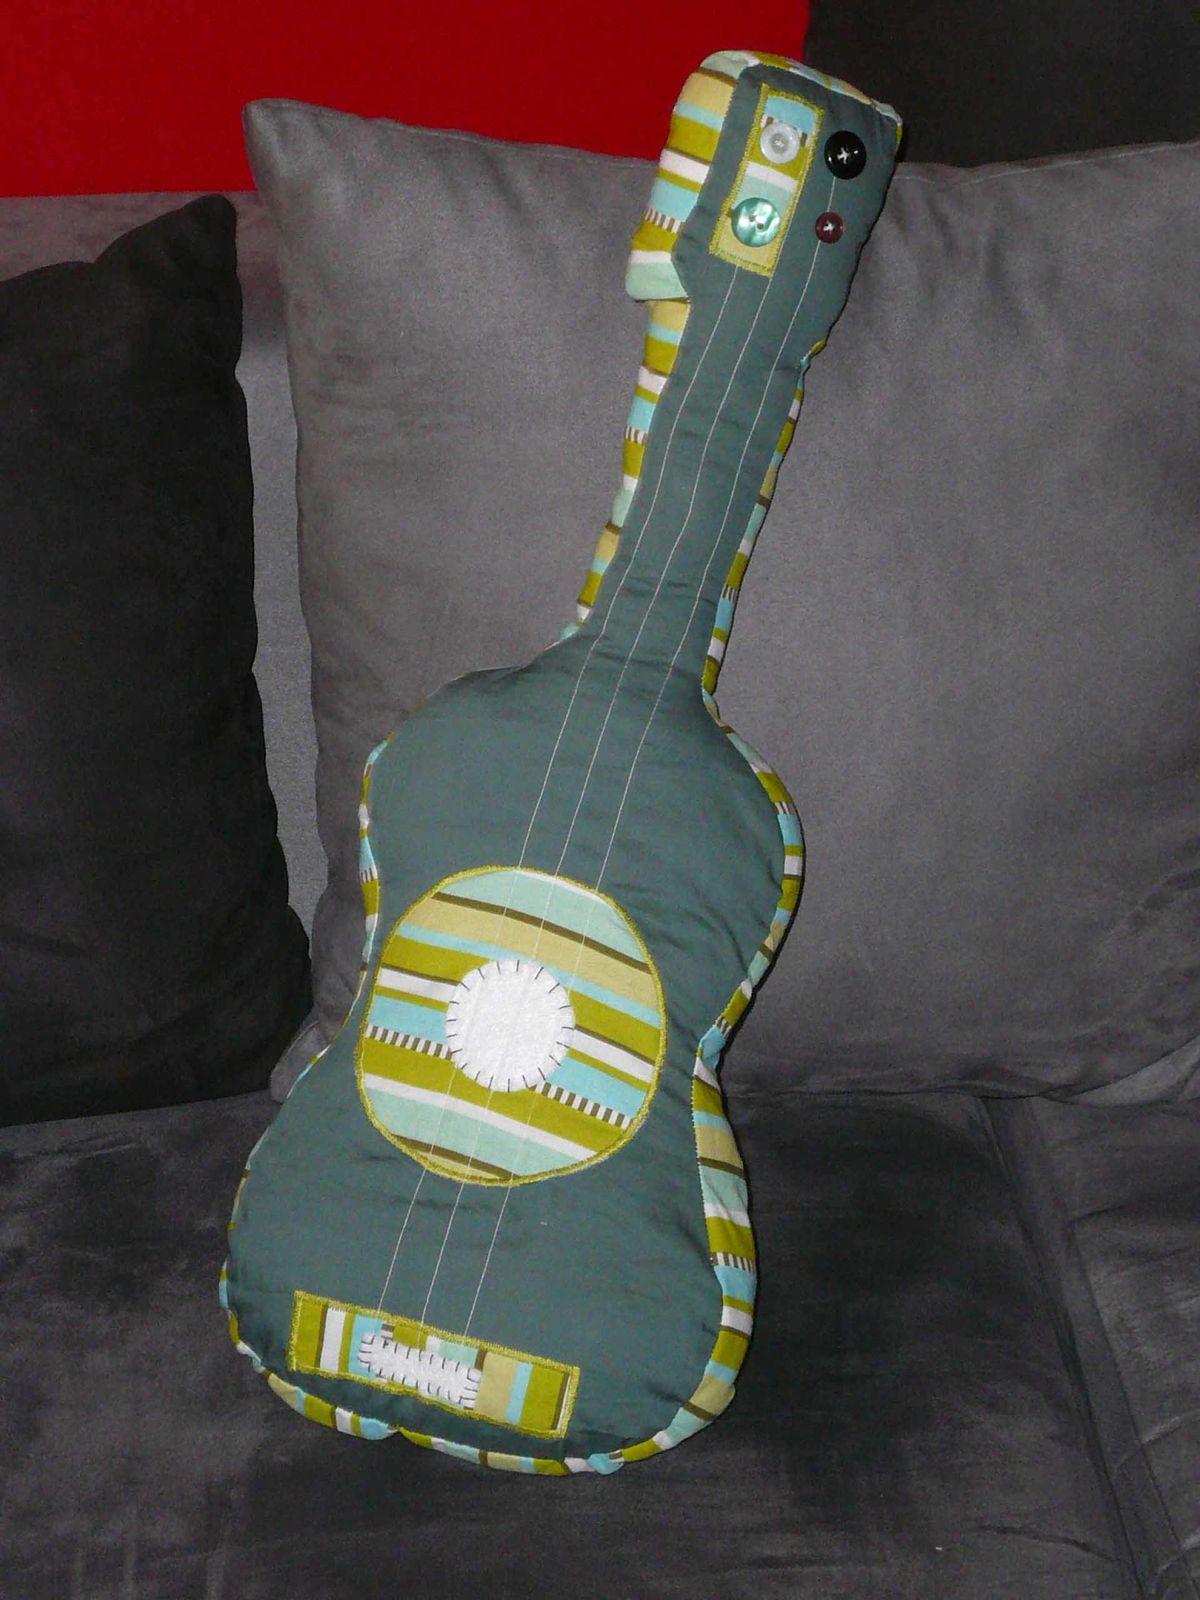 une guitare d'après ce tuto : http://www.pourmesjolismomes.com/2010/07/tuto-guitare-en-tissu.html